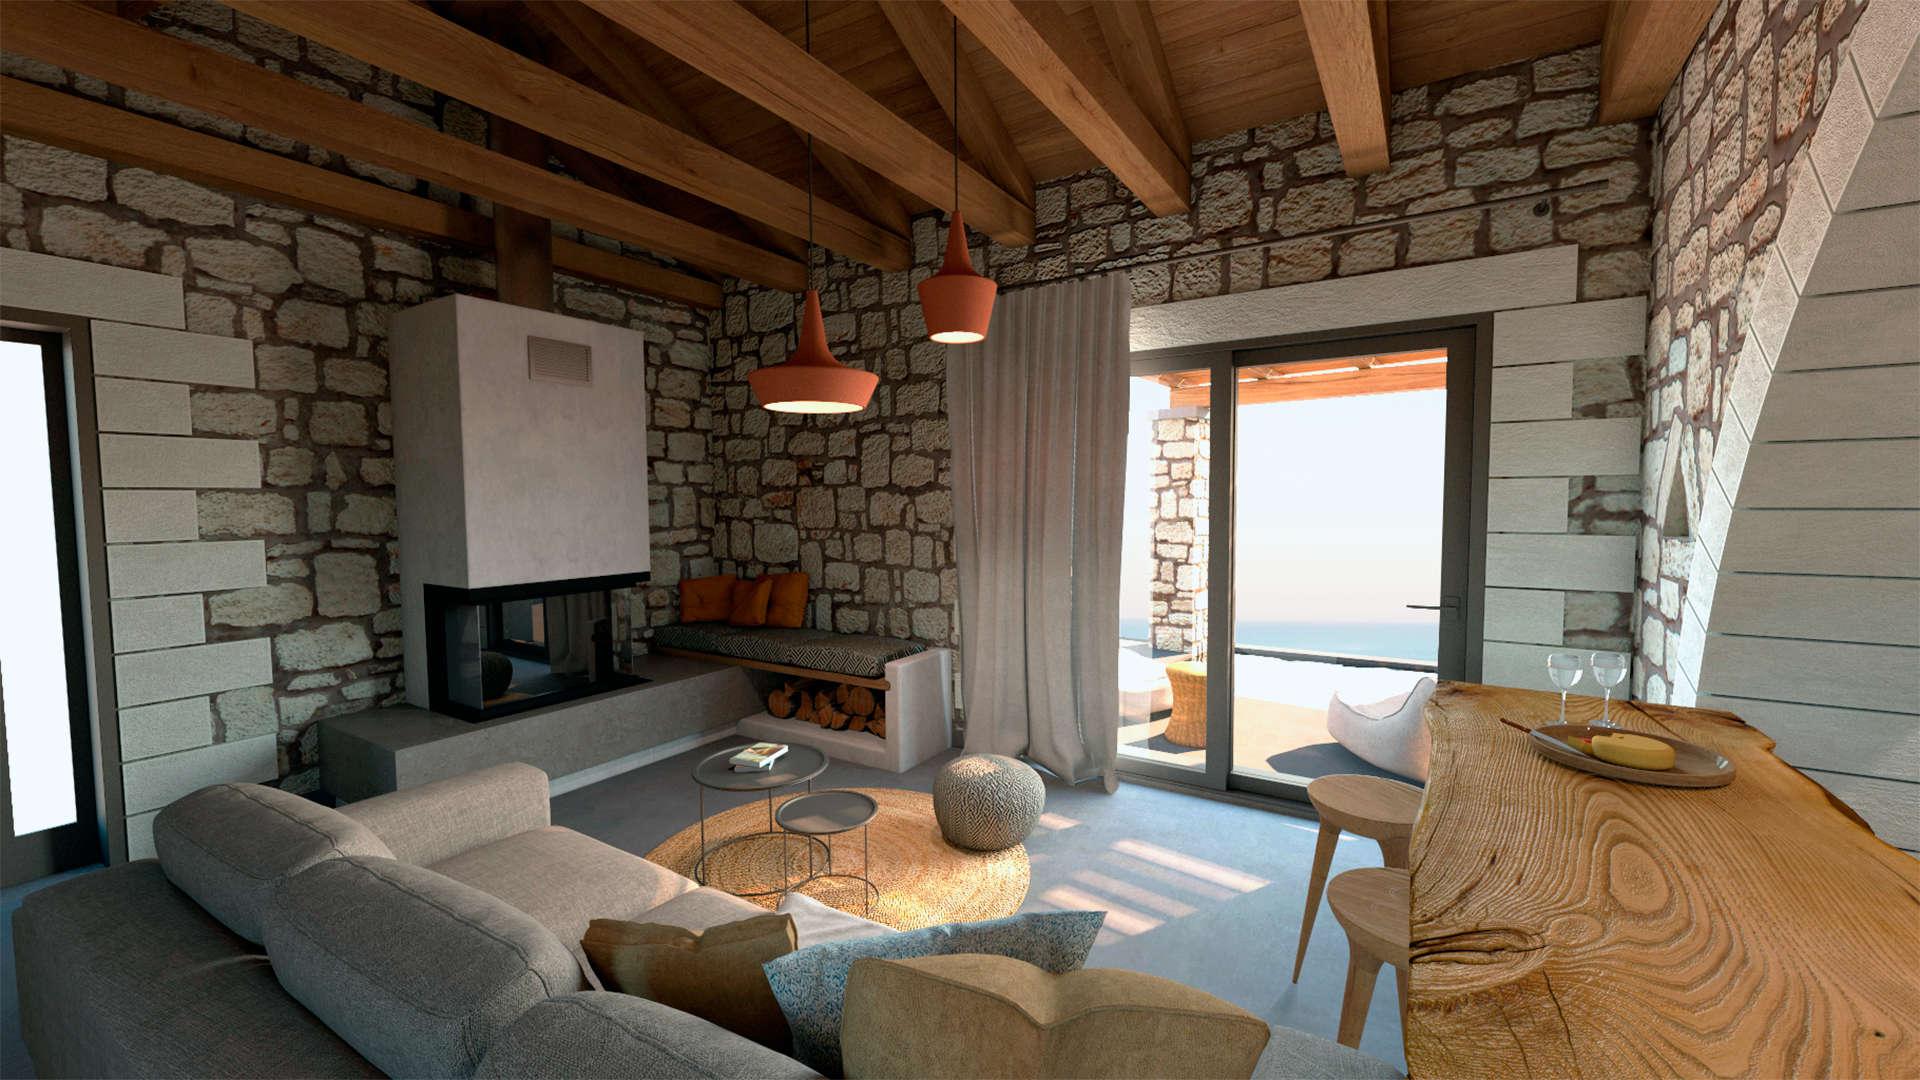 Holiday home, interior design, living room and fireplace. Παραθεριστική κατοικία, εσωτερικοί χώροι, καθιστικό με θέα, τζάκι.